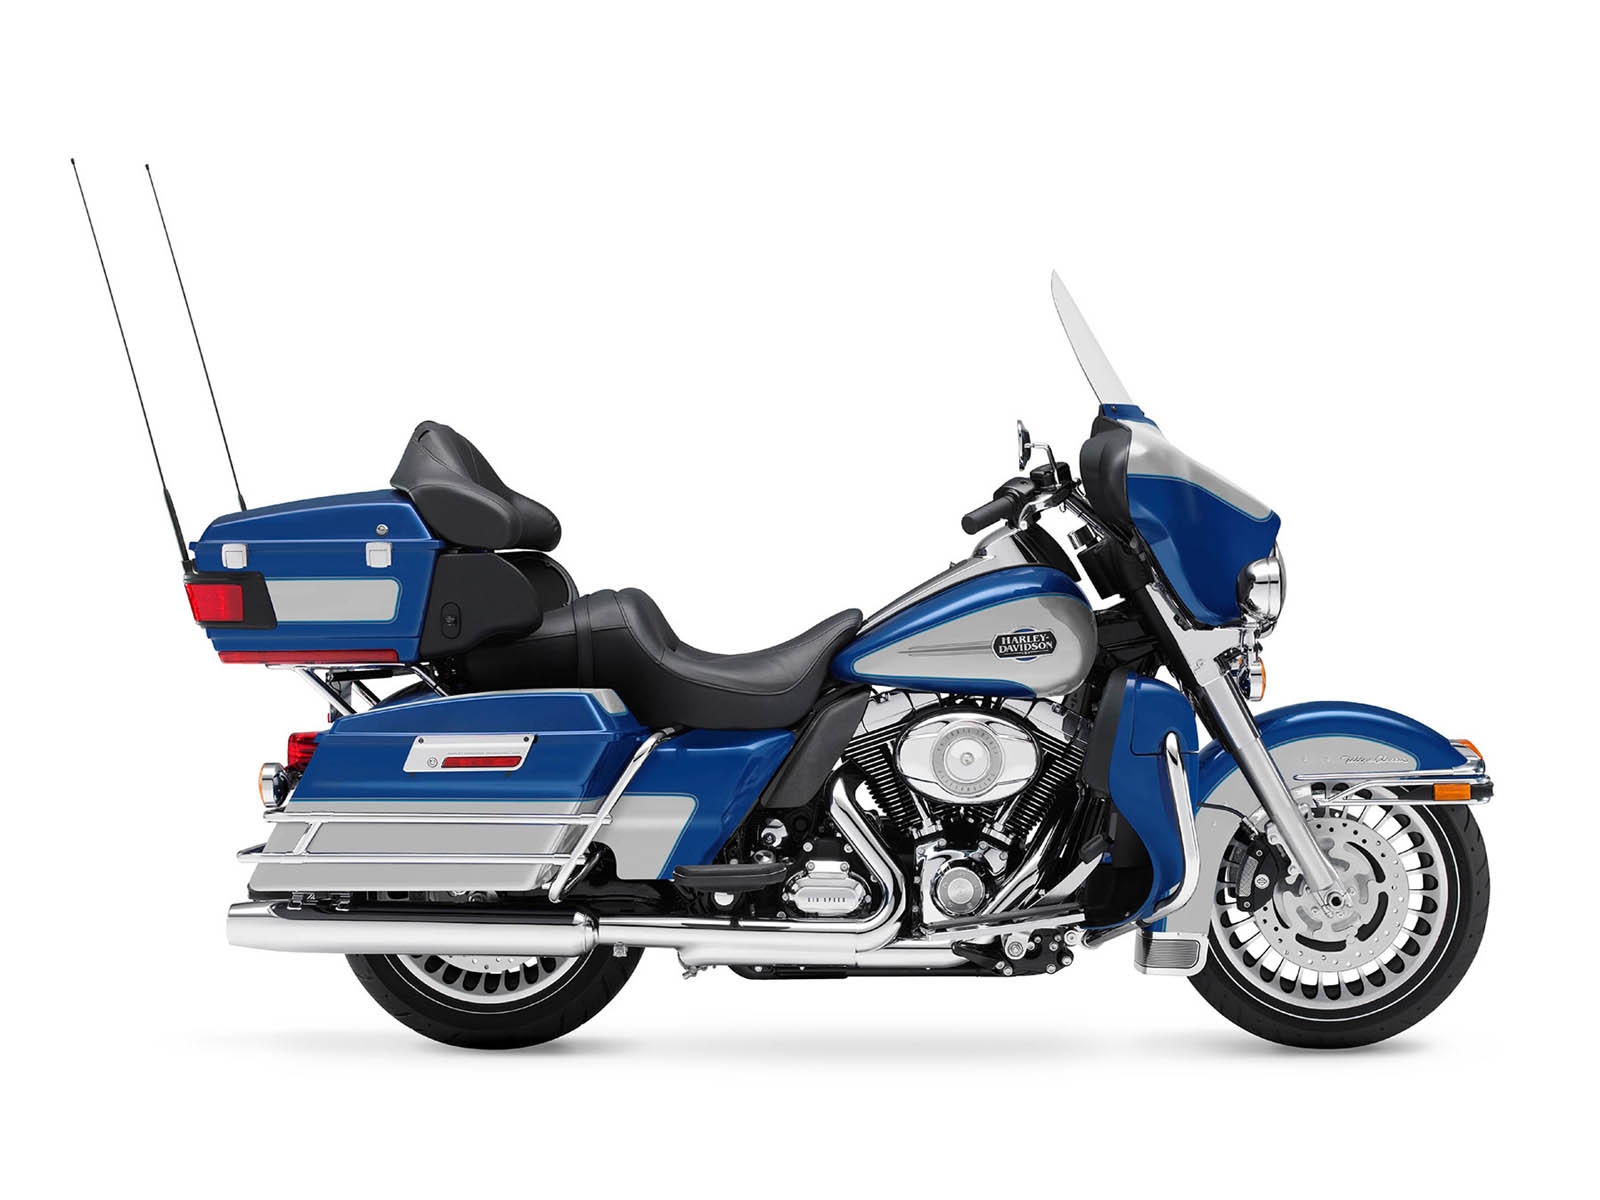 Hdforums Harley Davidson Ultra Classic Electra Glide Flhtcu Bike